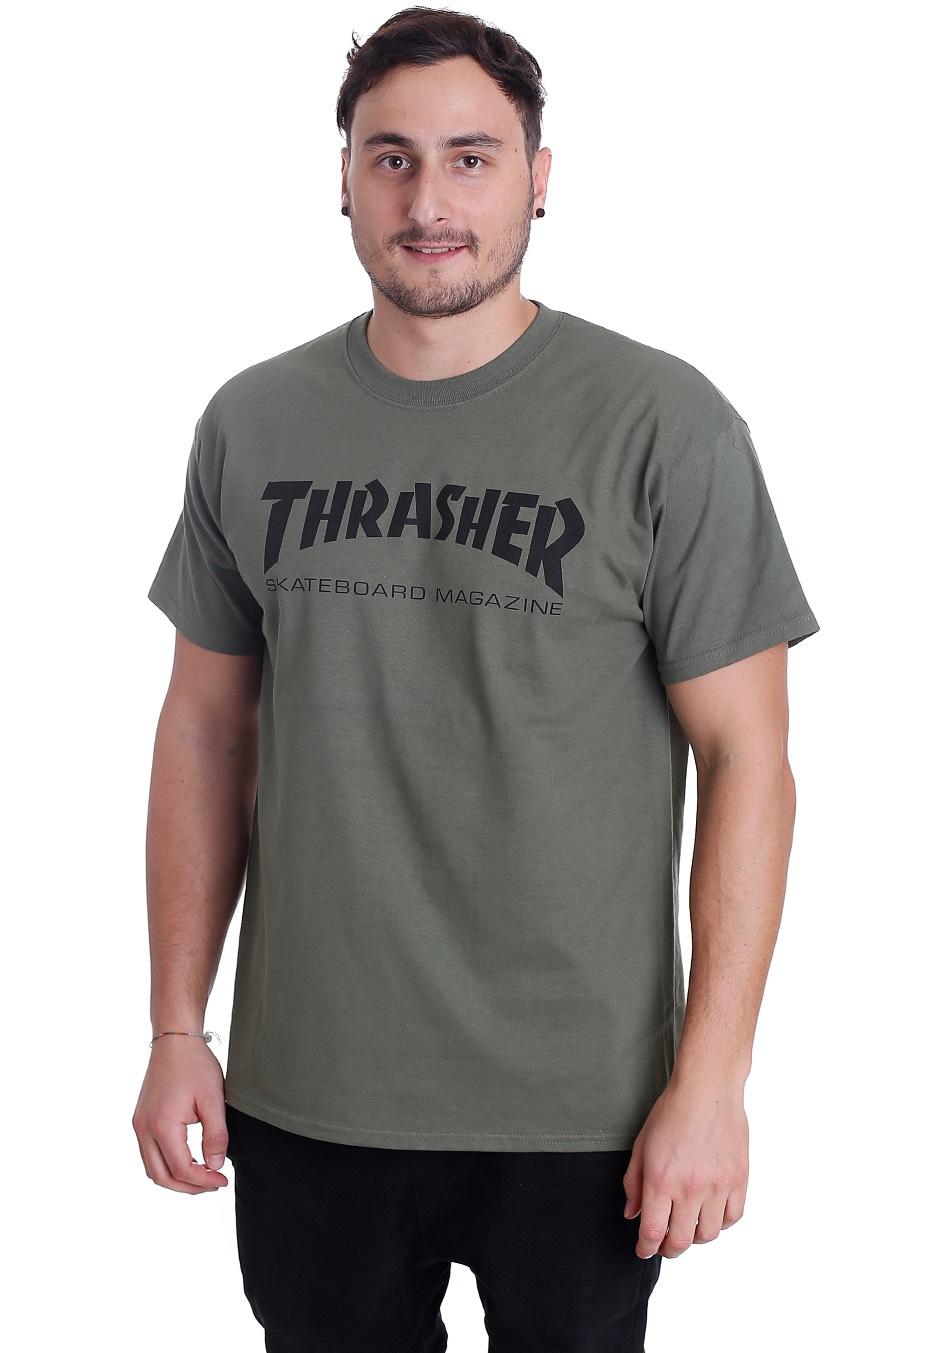 49b2c2d72eef Thrasher - Thrasher Skate-Mag Army - T-Shirt - Streetwear Shop ...